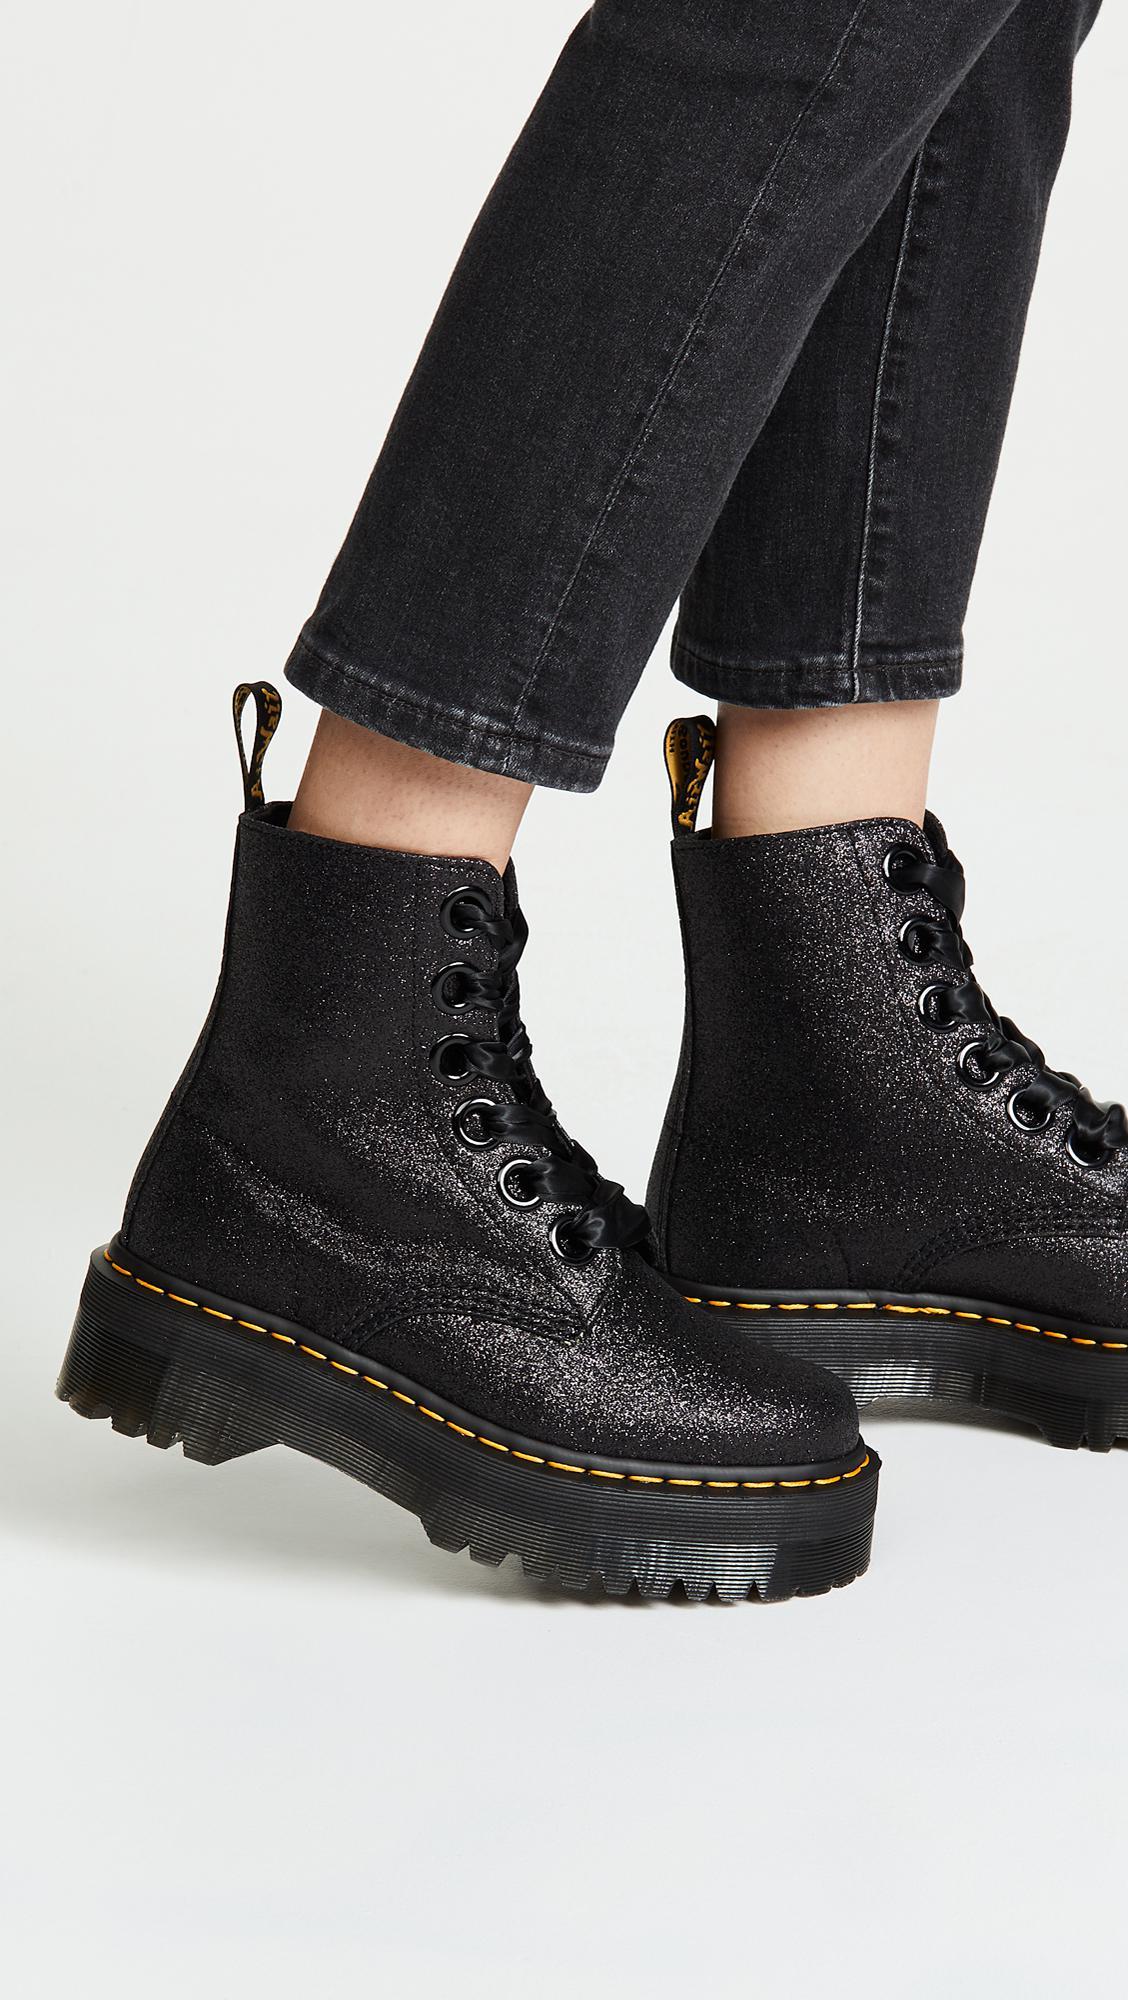 5f147e4f528d Lyst - Dr. Martens Molly Glitter 6 Eye Boots in Black